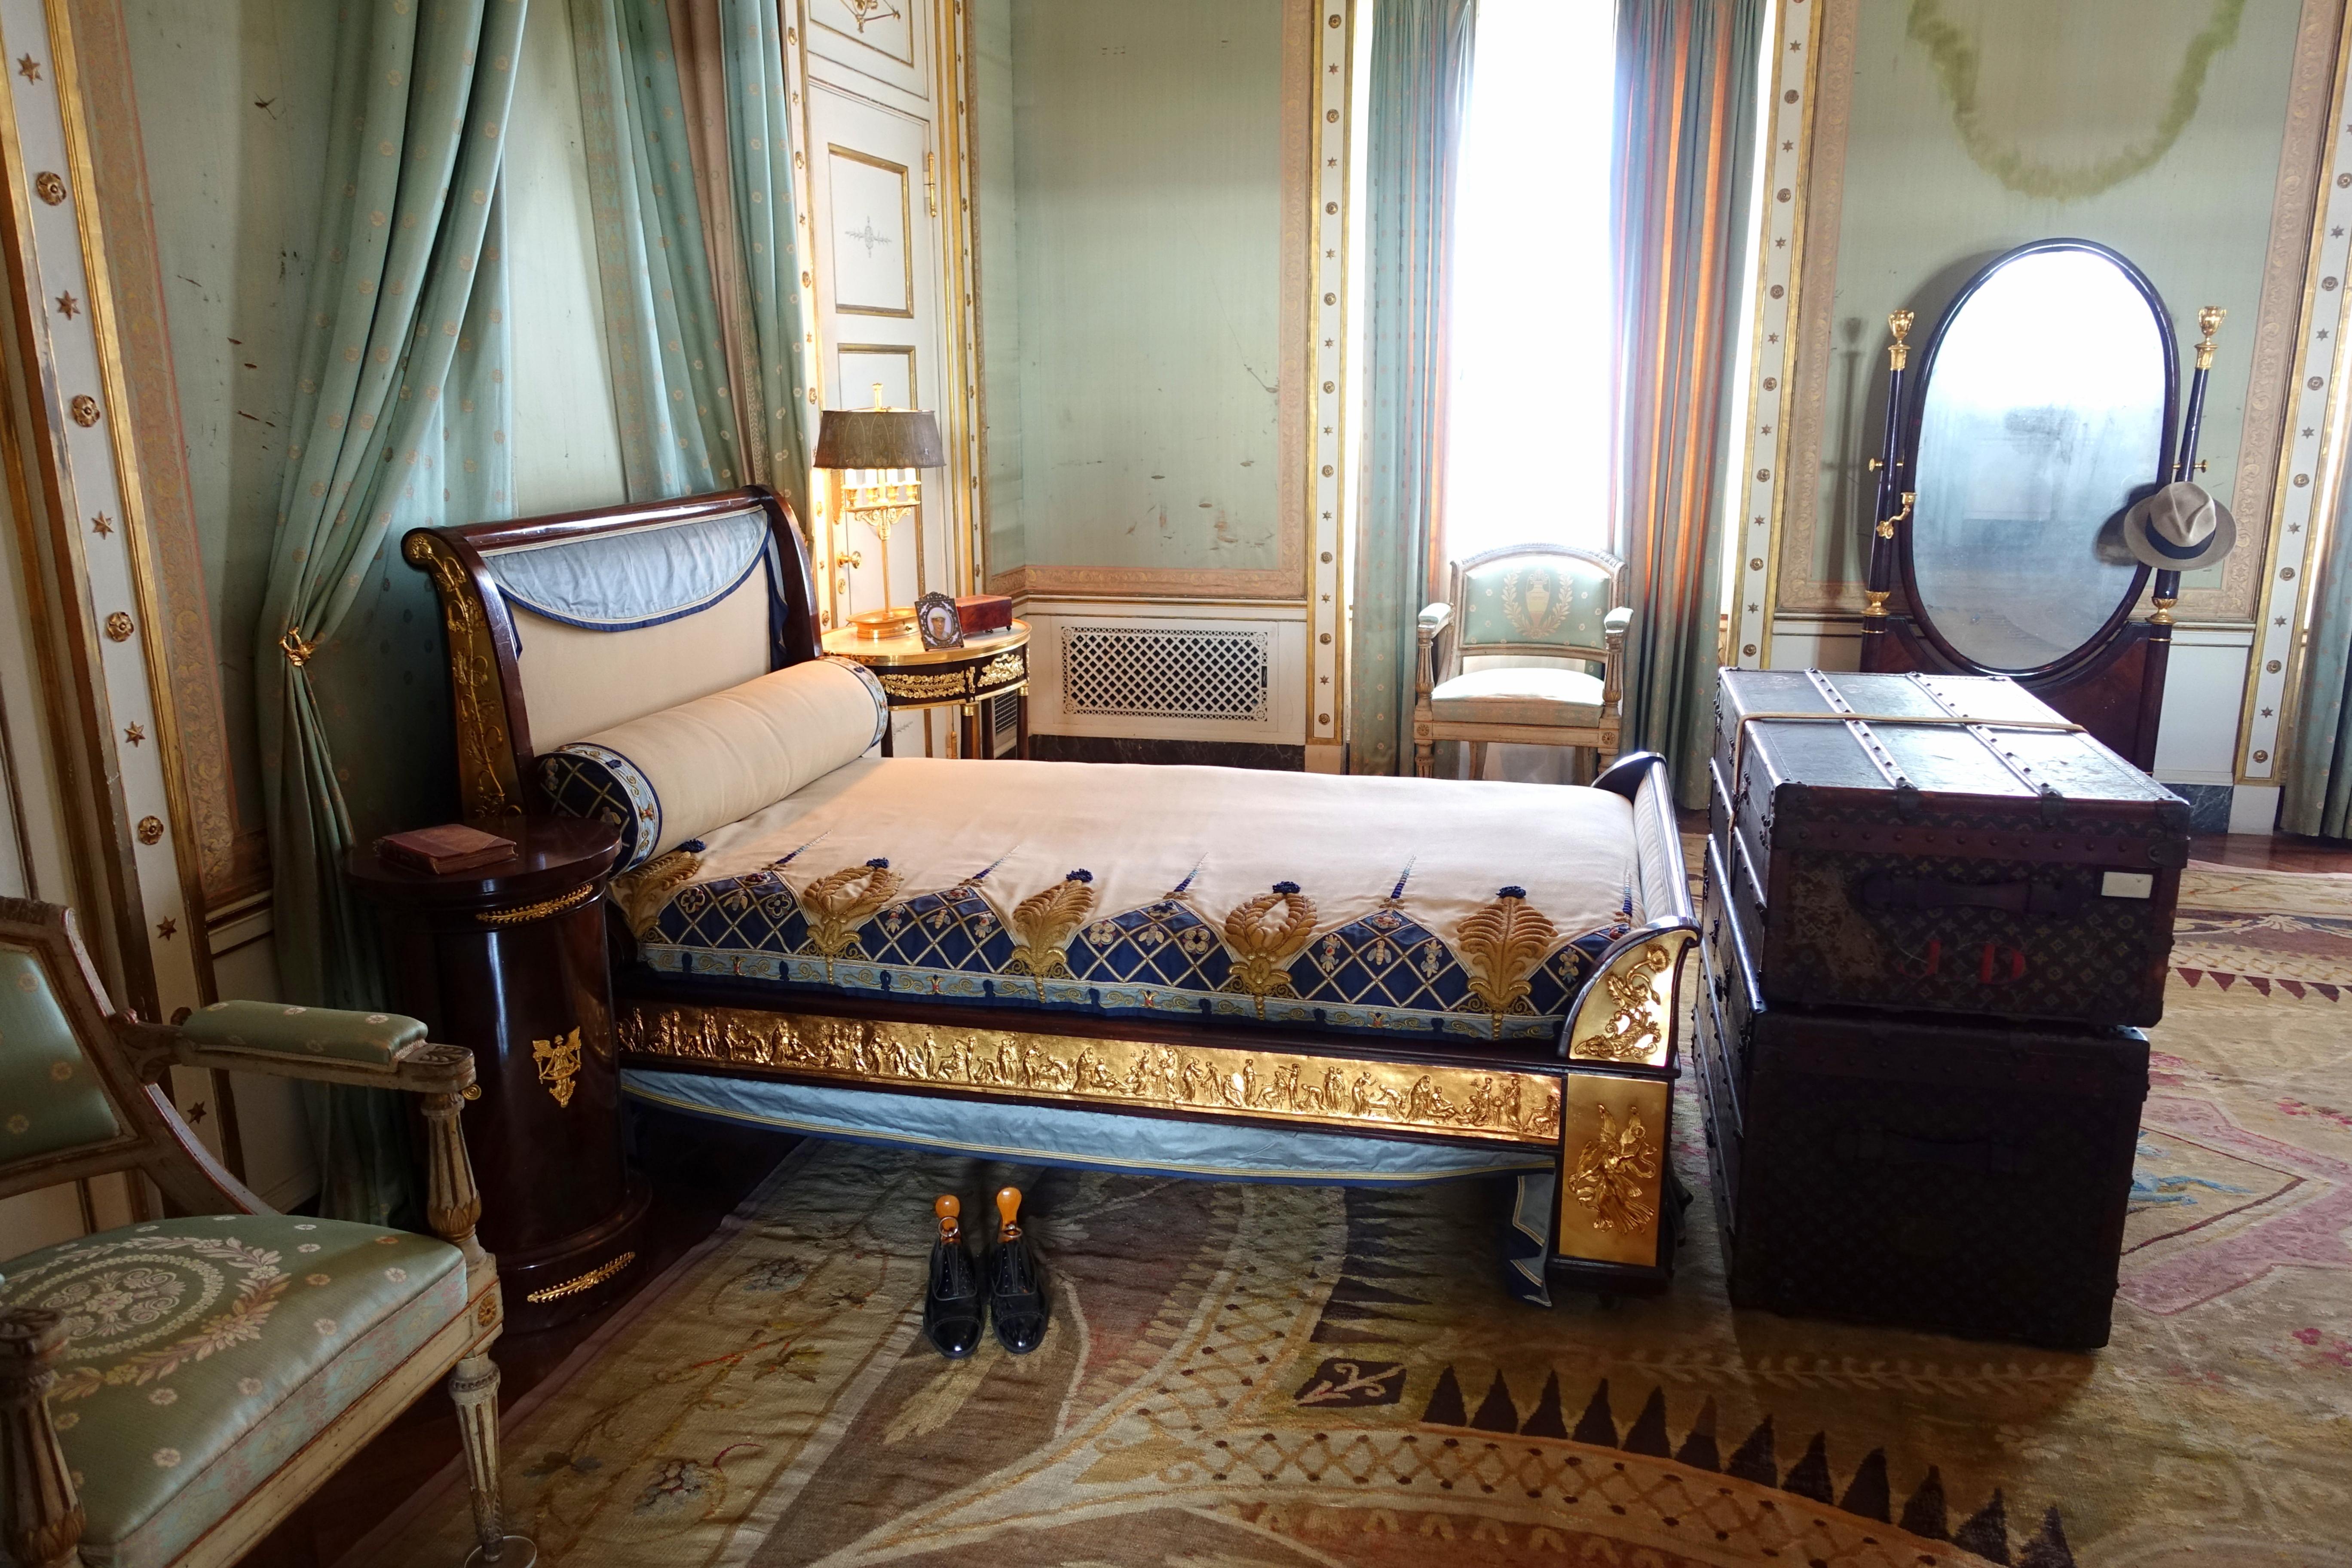 File:Deering Bedroom - Vizcaya Museum and Gardens - Miami ...